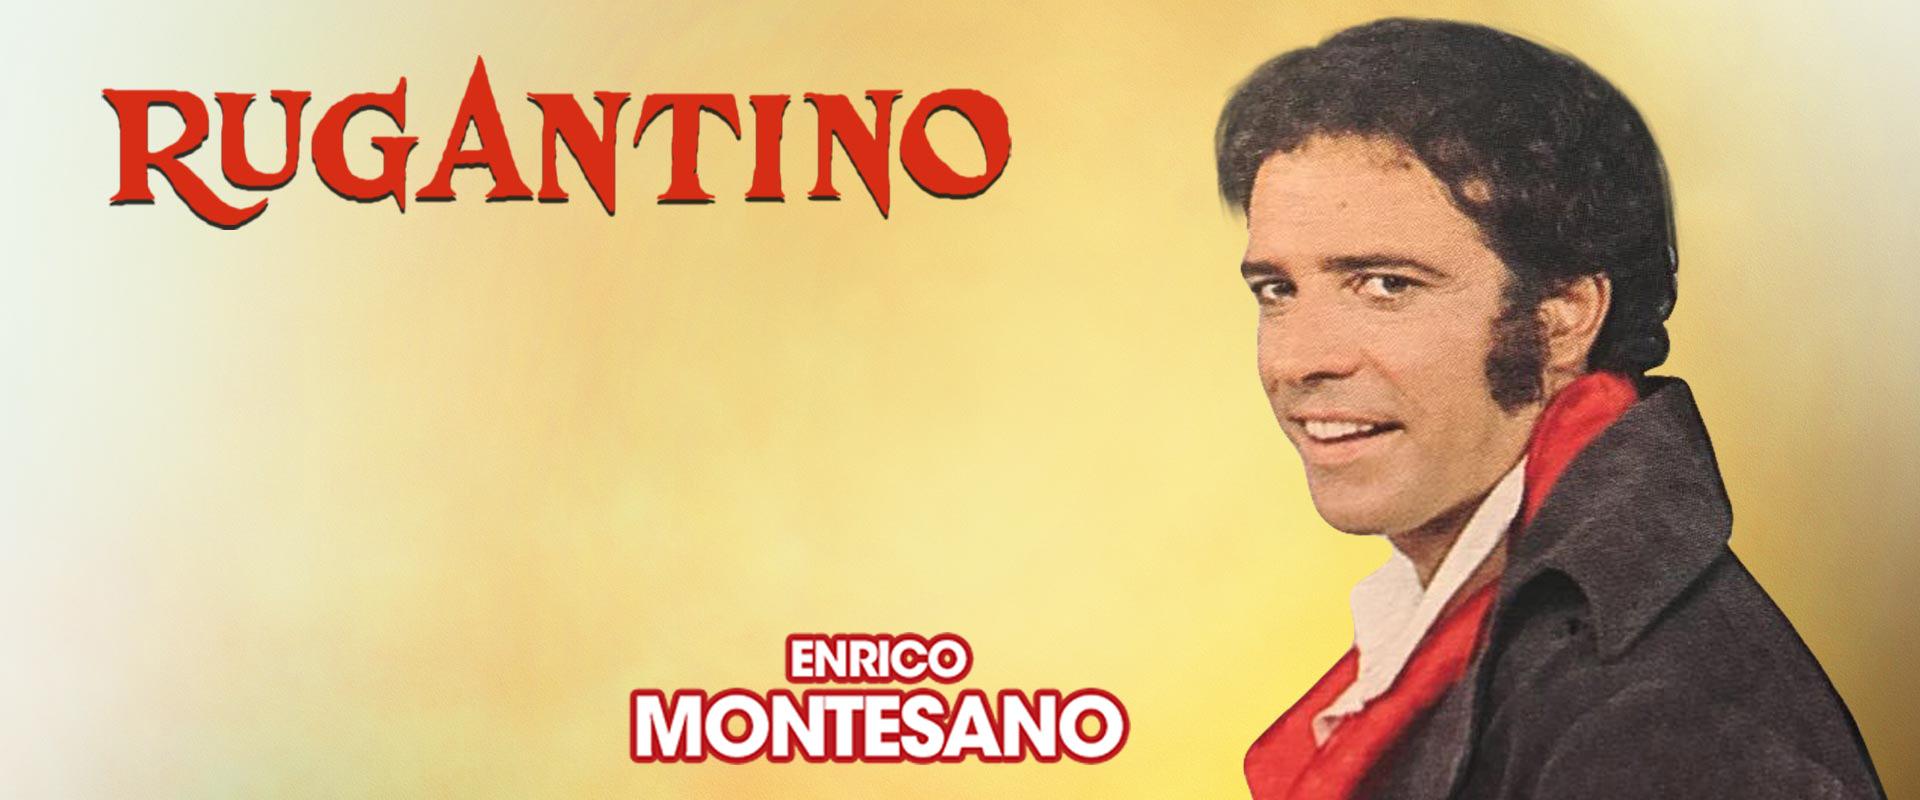 Al Gennaio Sistina Teatro 27 Rugantino Fino ᄄC ChtsQrdx